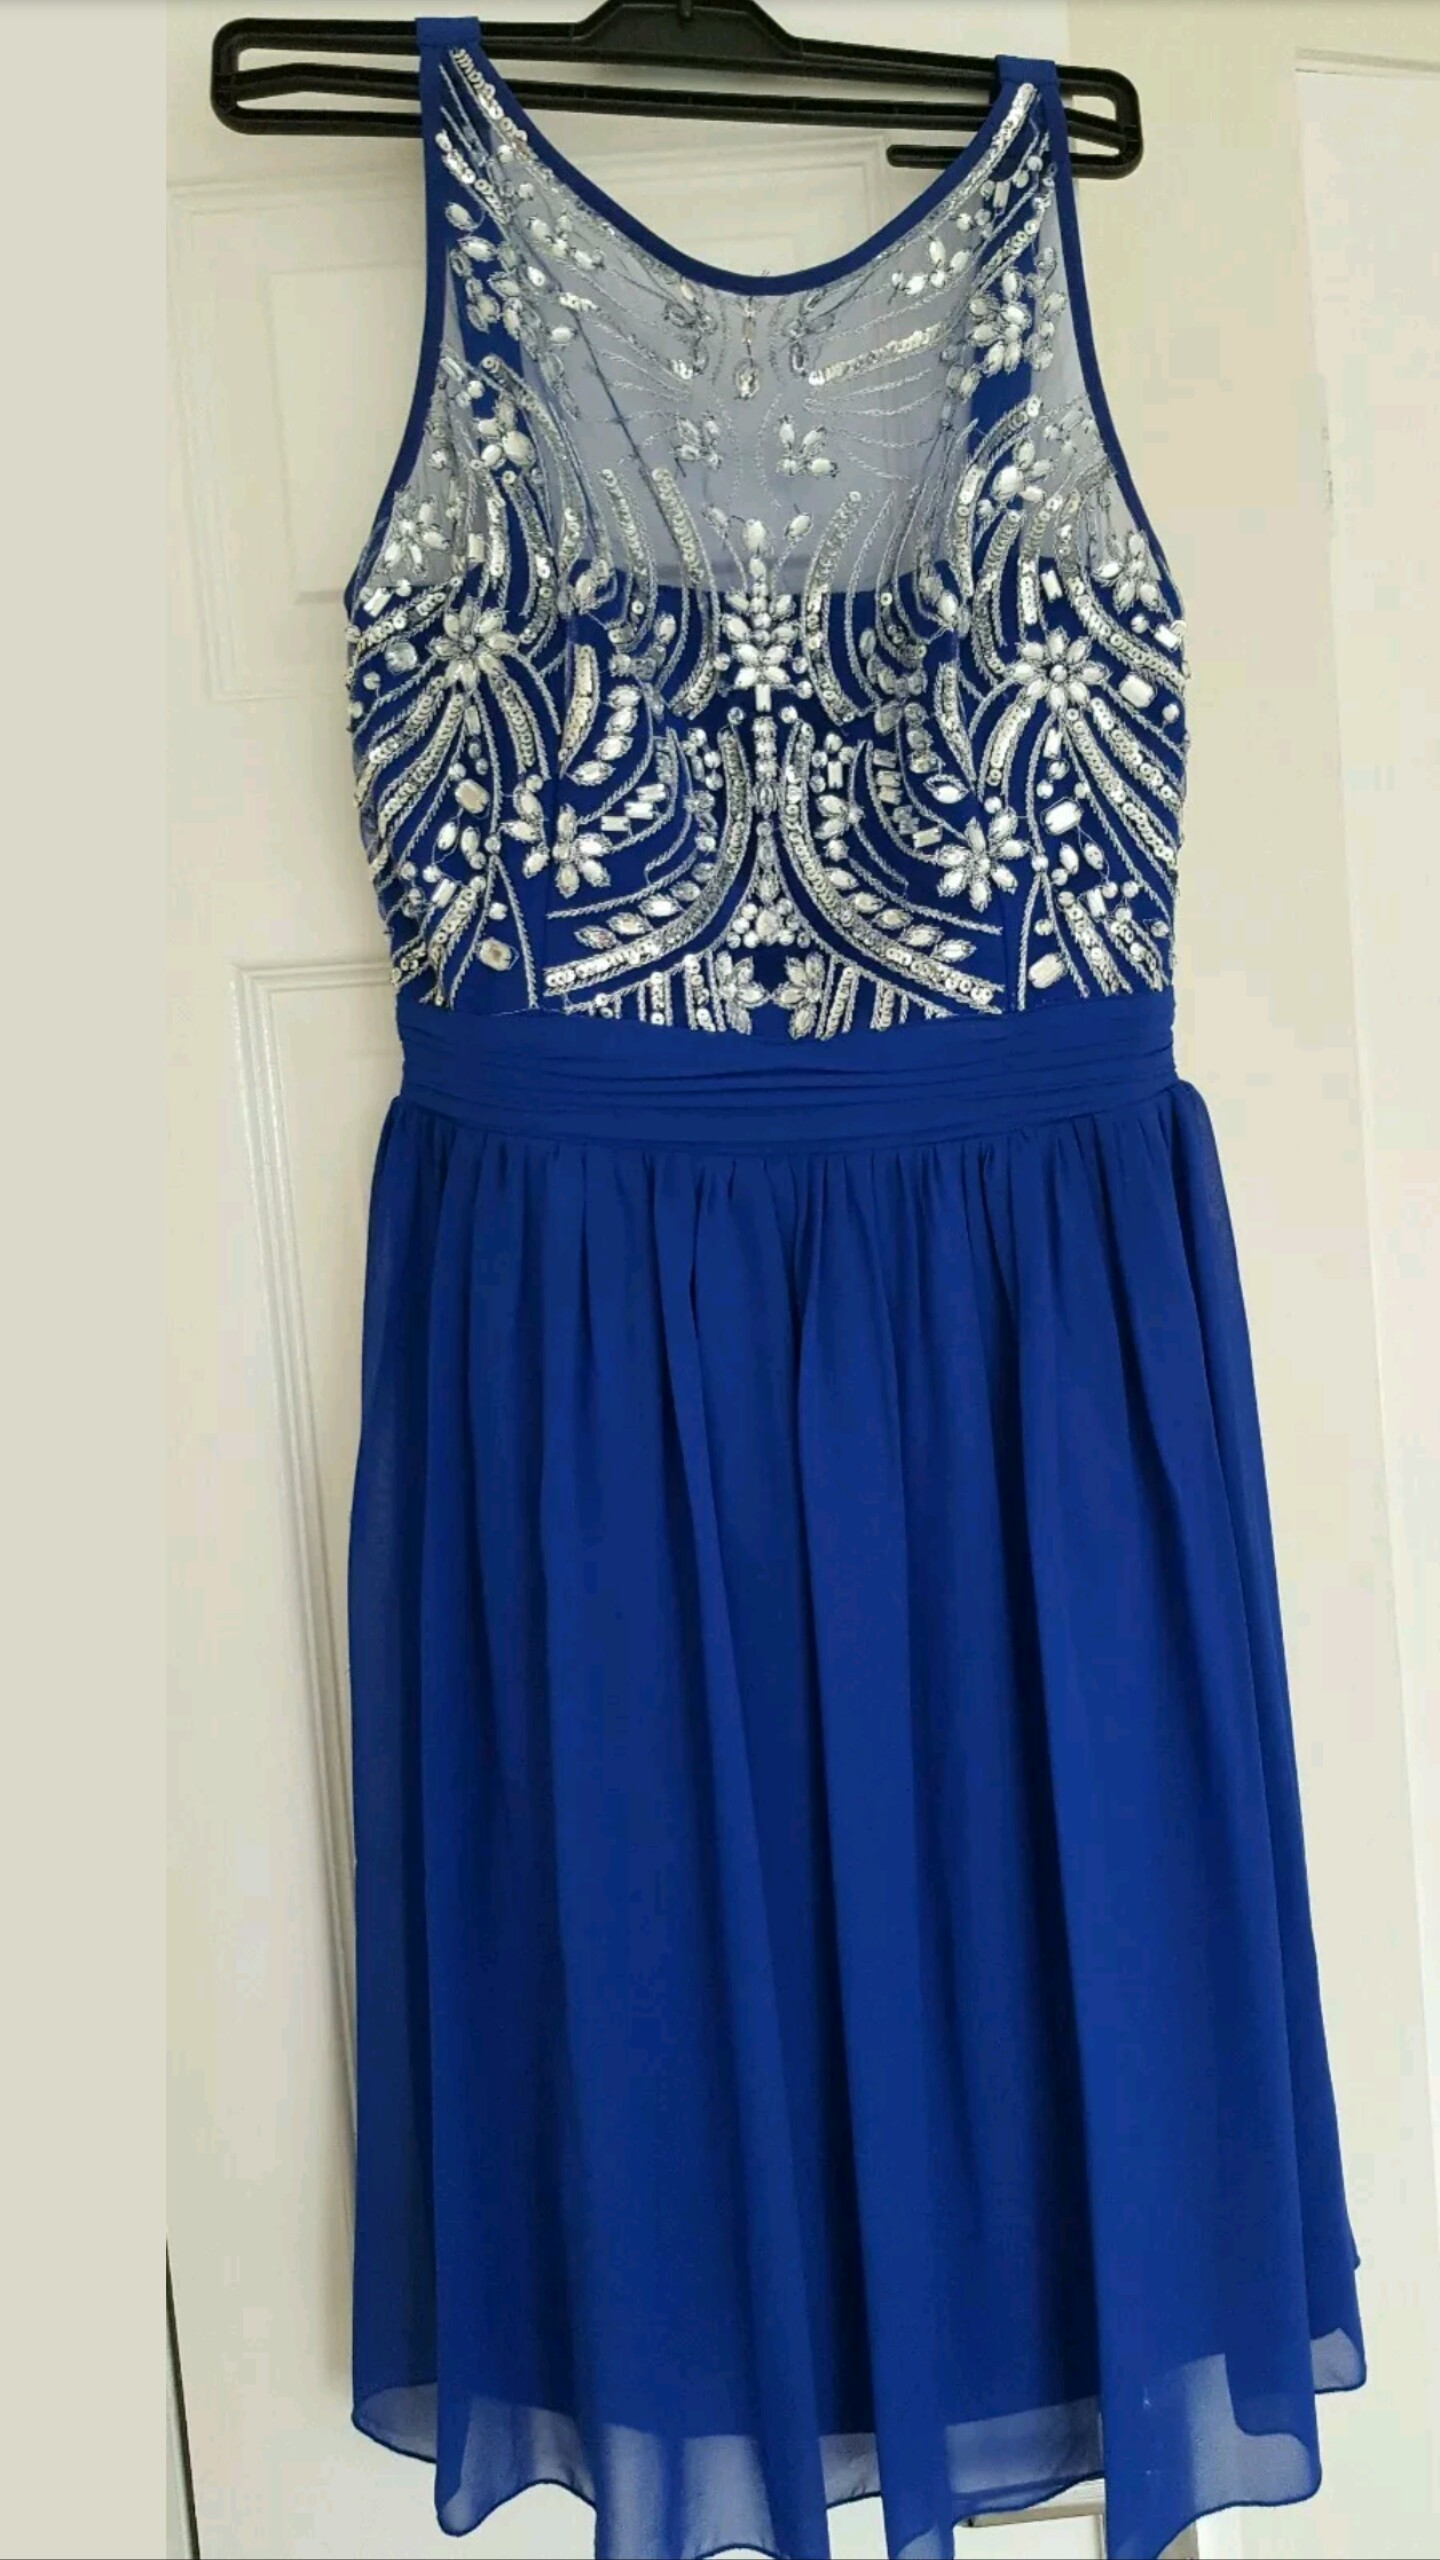 Petrol blue dress quiz